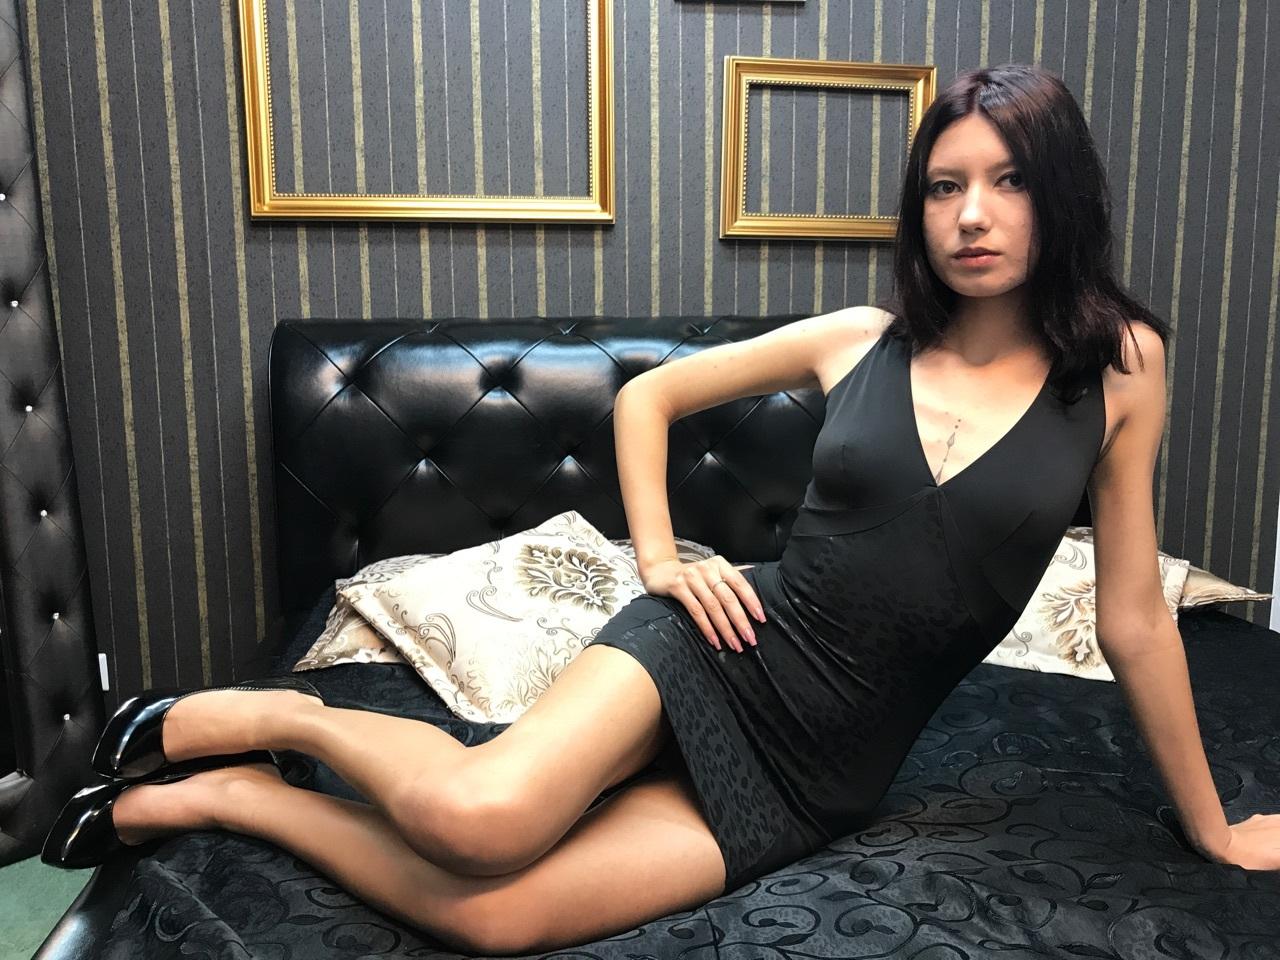 Evahotちゃん  - セクシー系  アダルトチャットガール